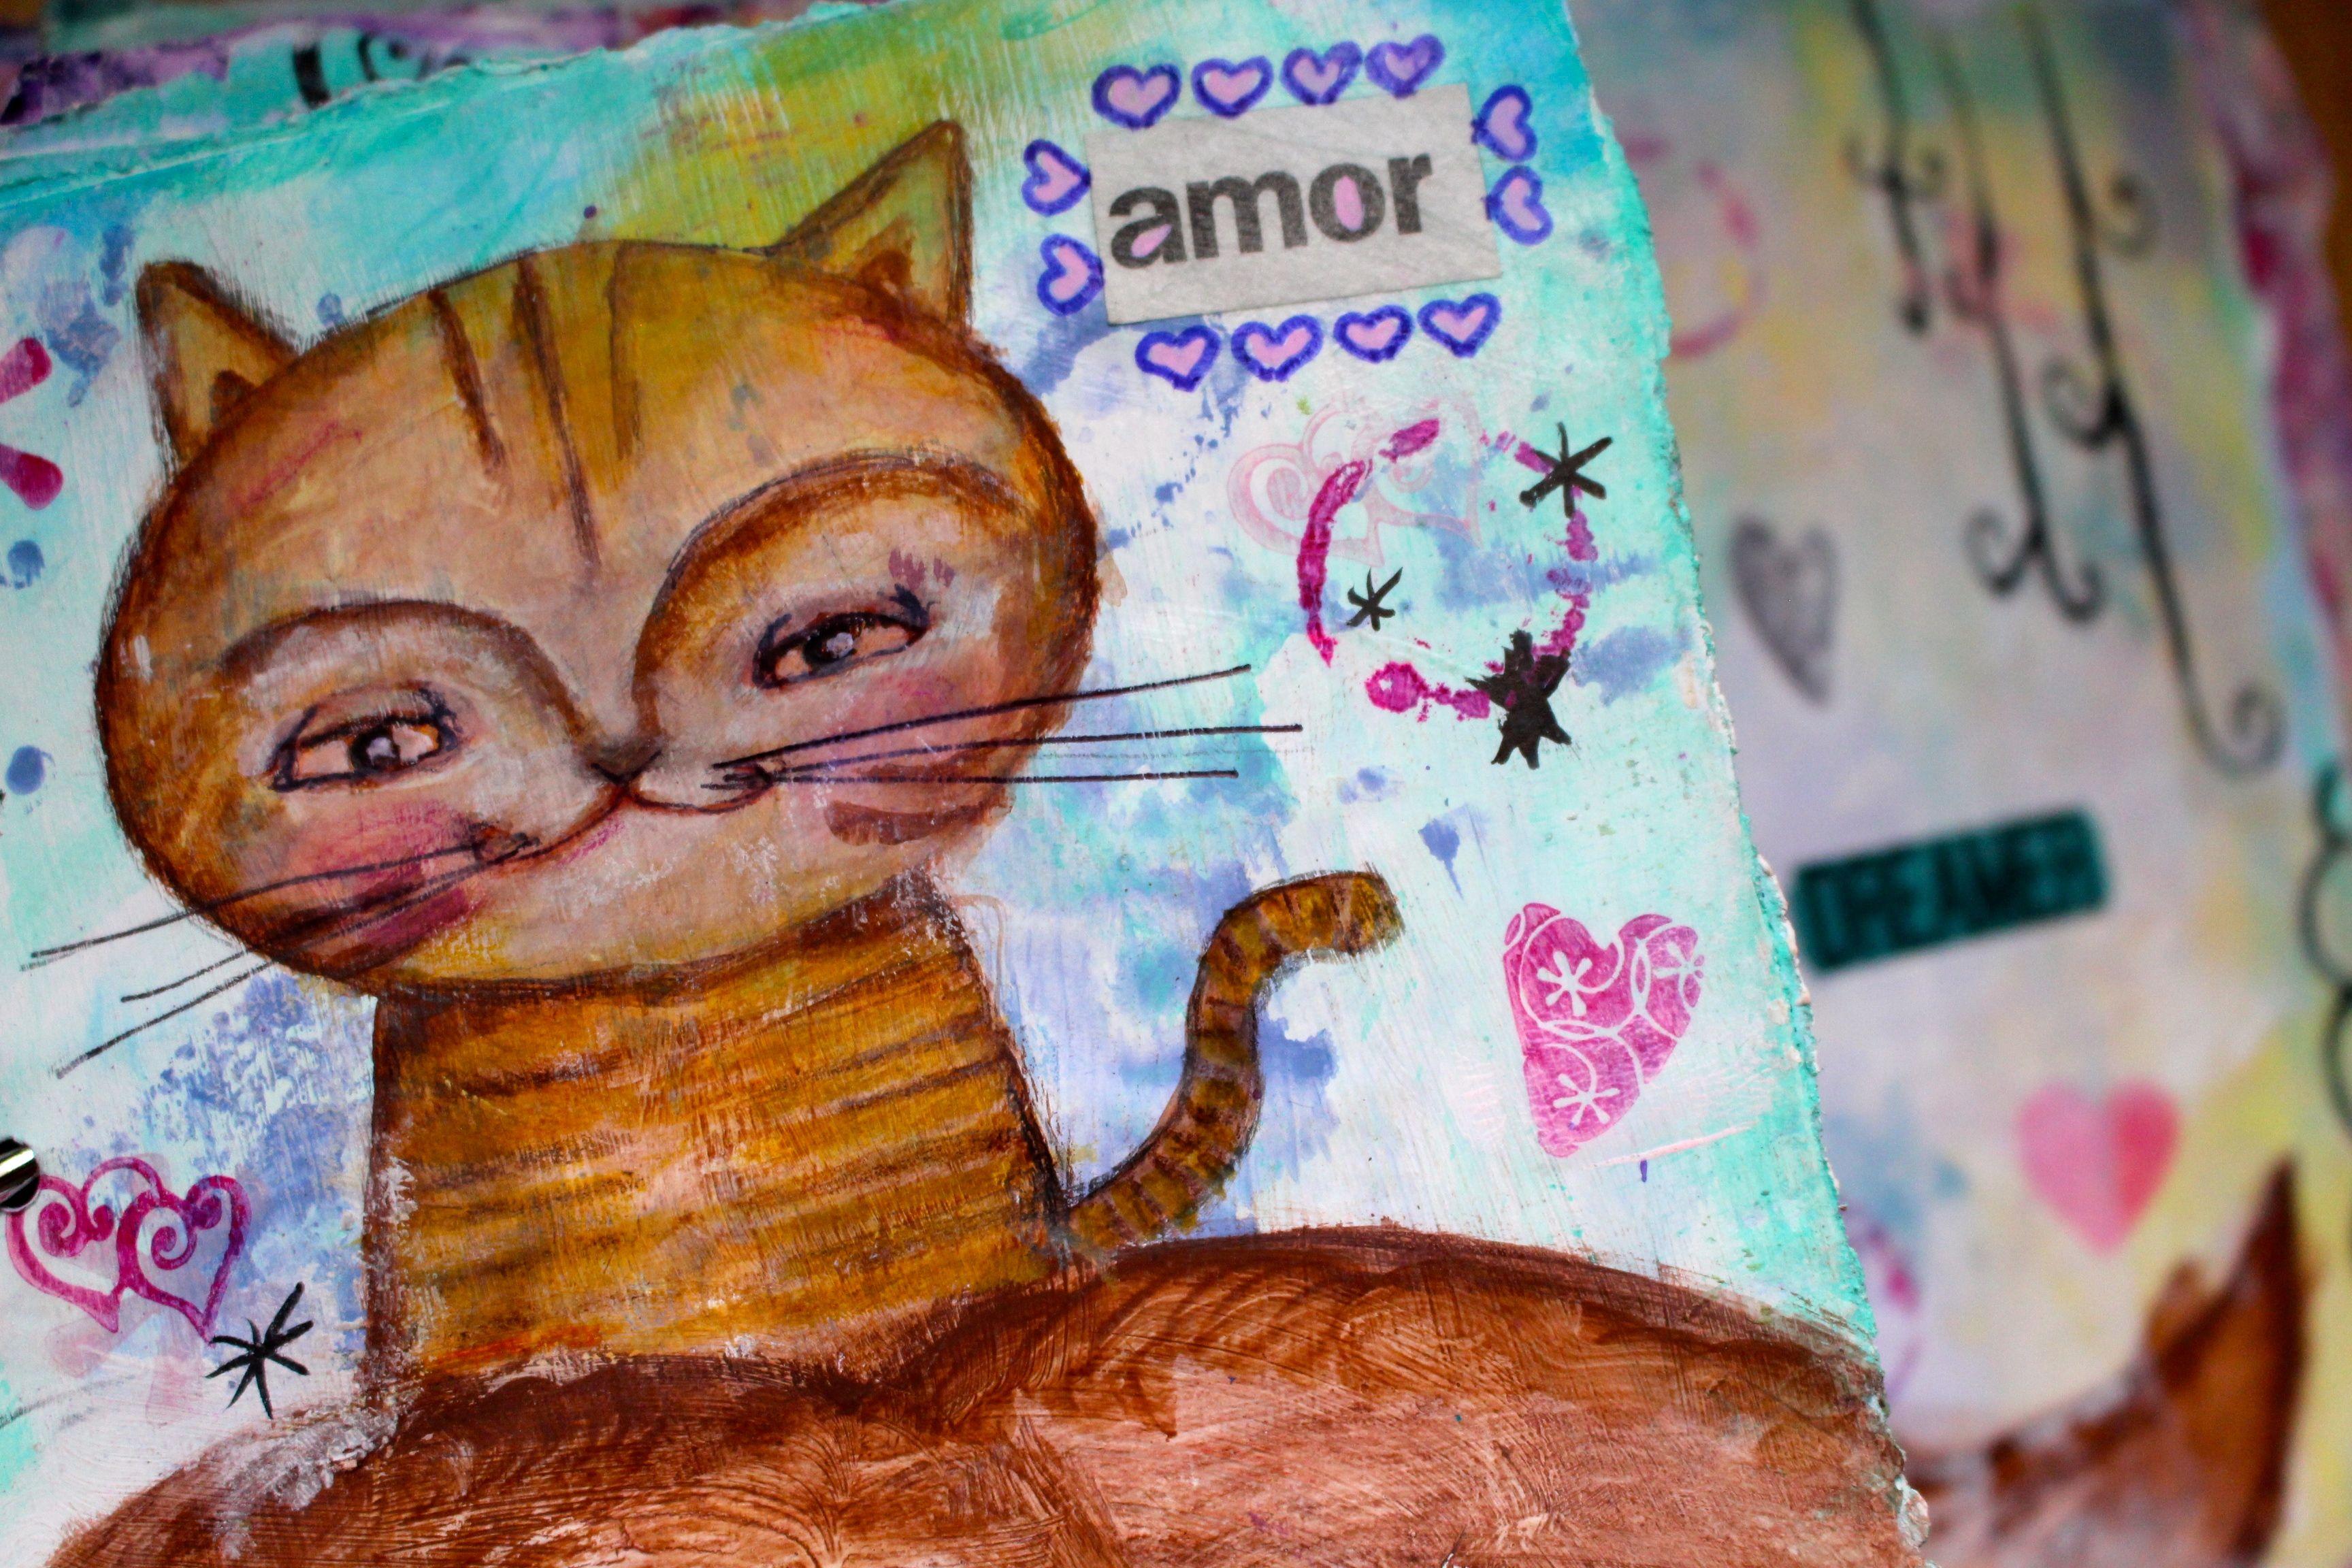 mixmedia, mixedmedia, artjournal, art, mixmediaart, mixedmediaart, details, detalles, cat, gato, gatito, kitty